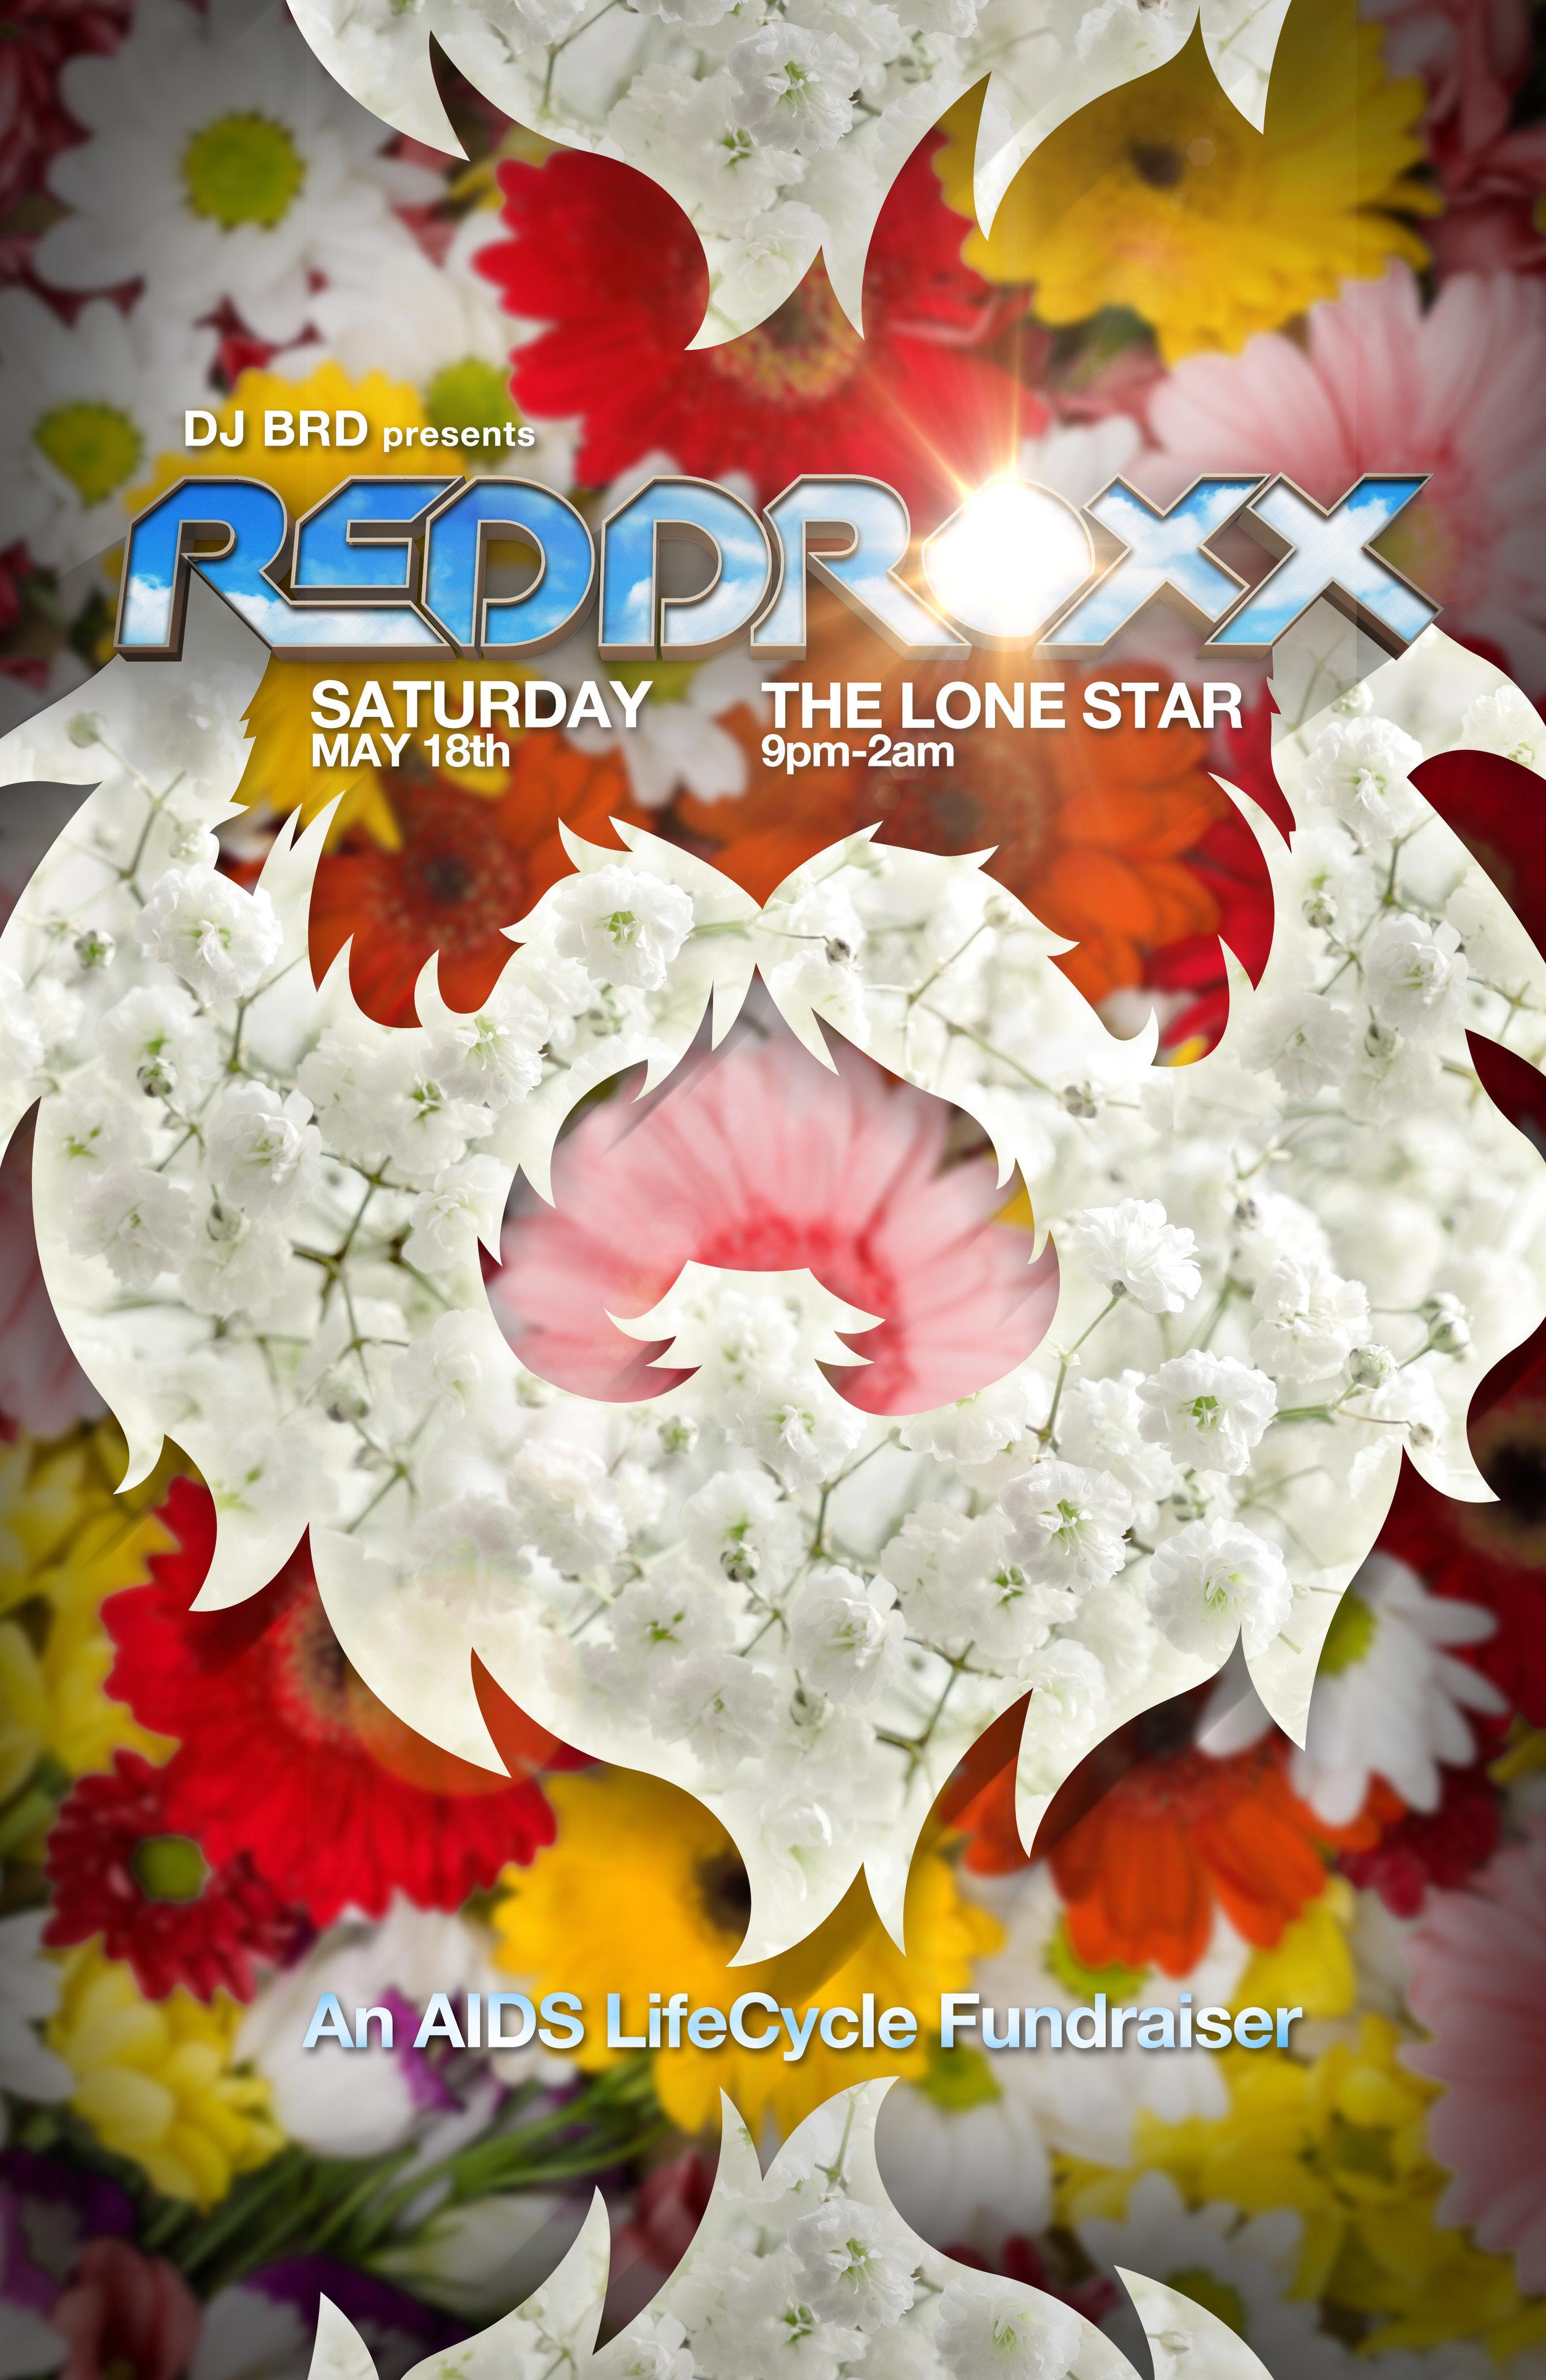 reddroxx_flyer85_11x17.jpg